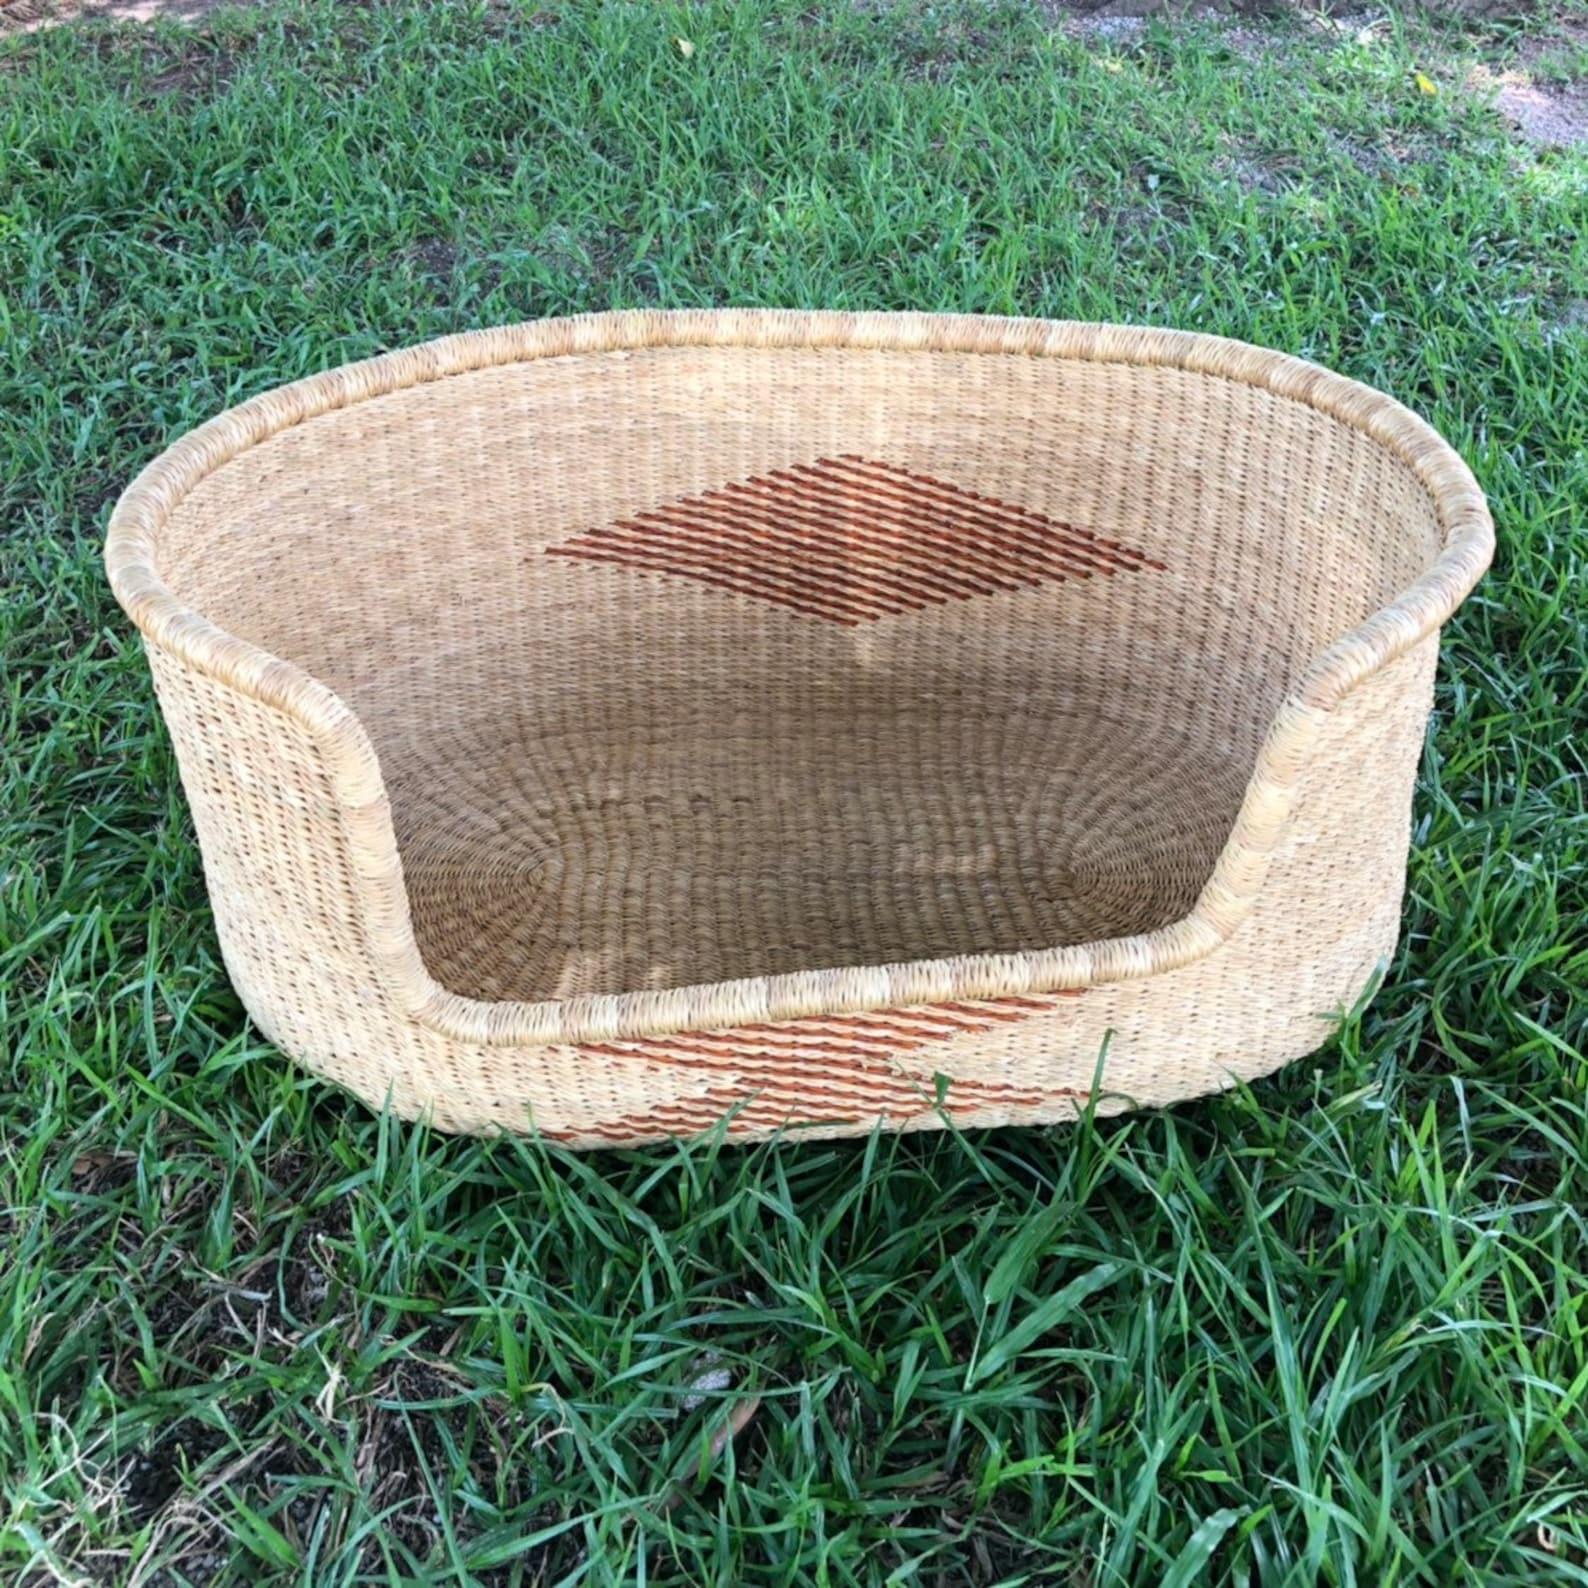 Basket style dog rattan bed